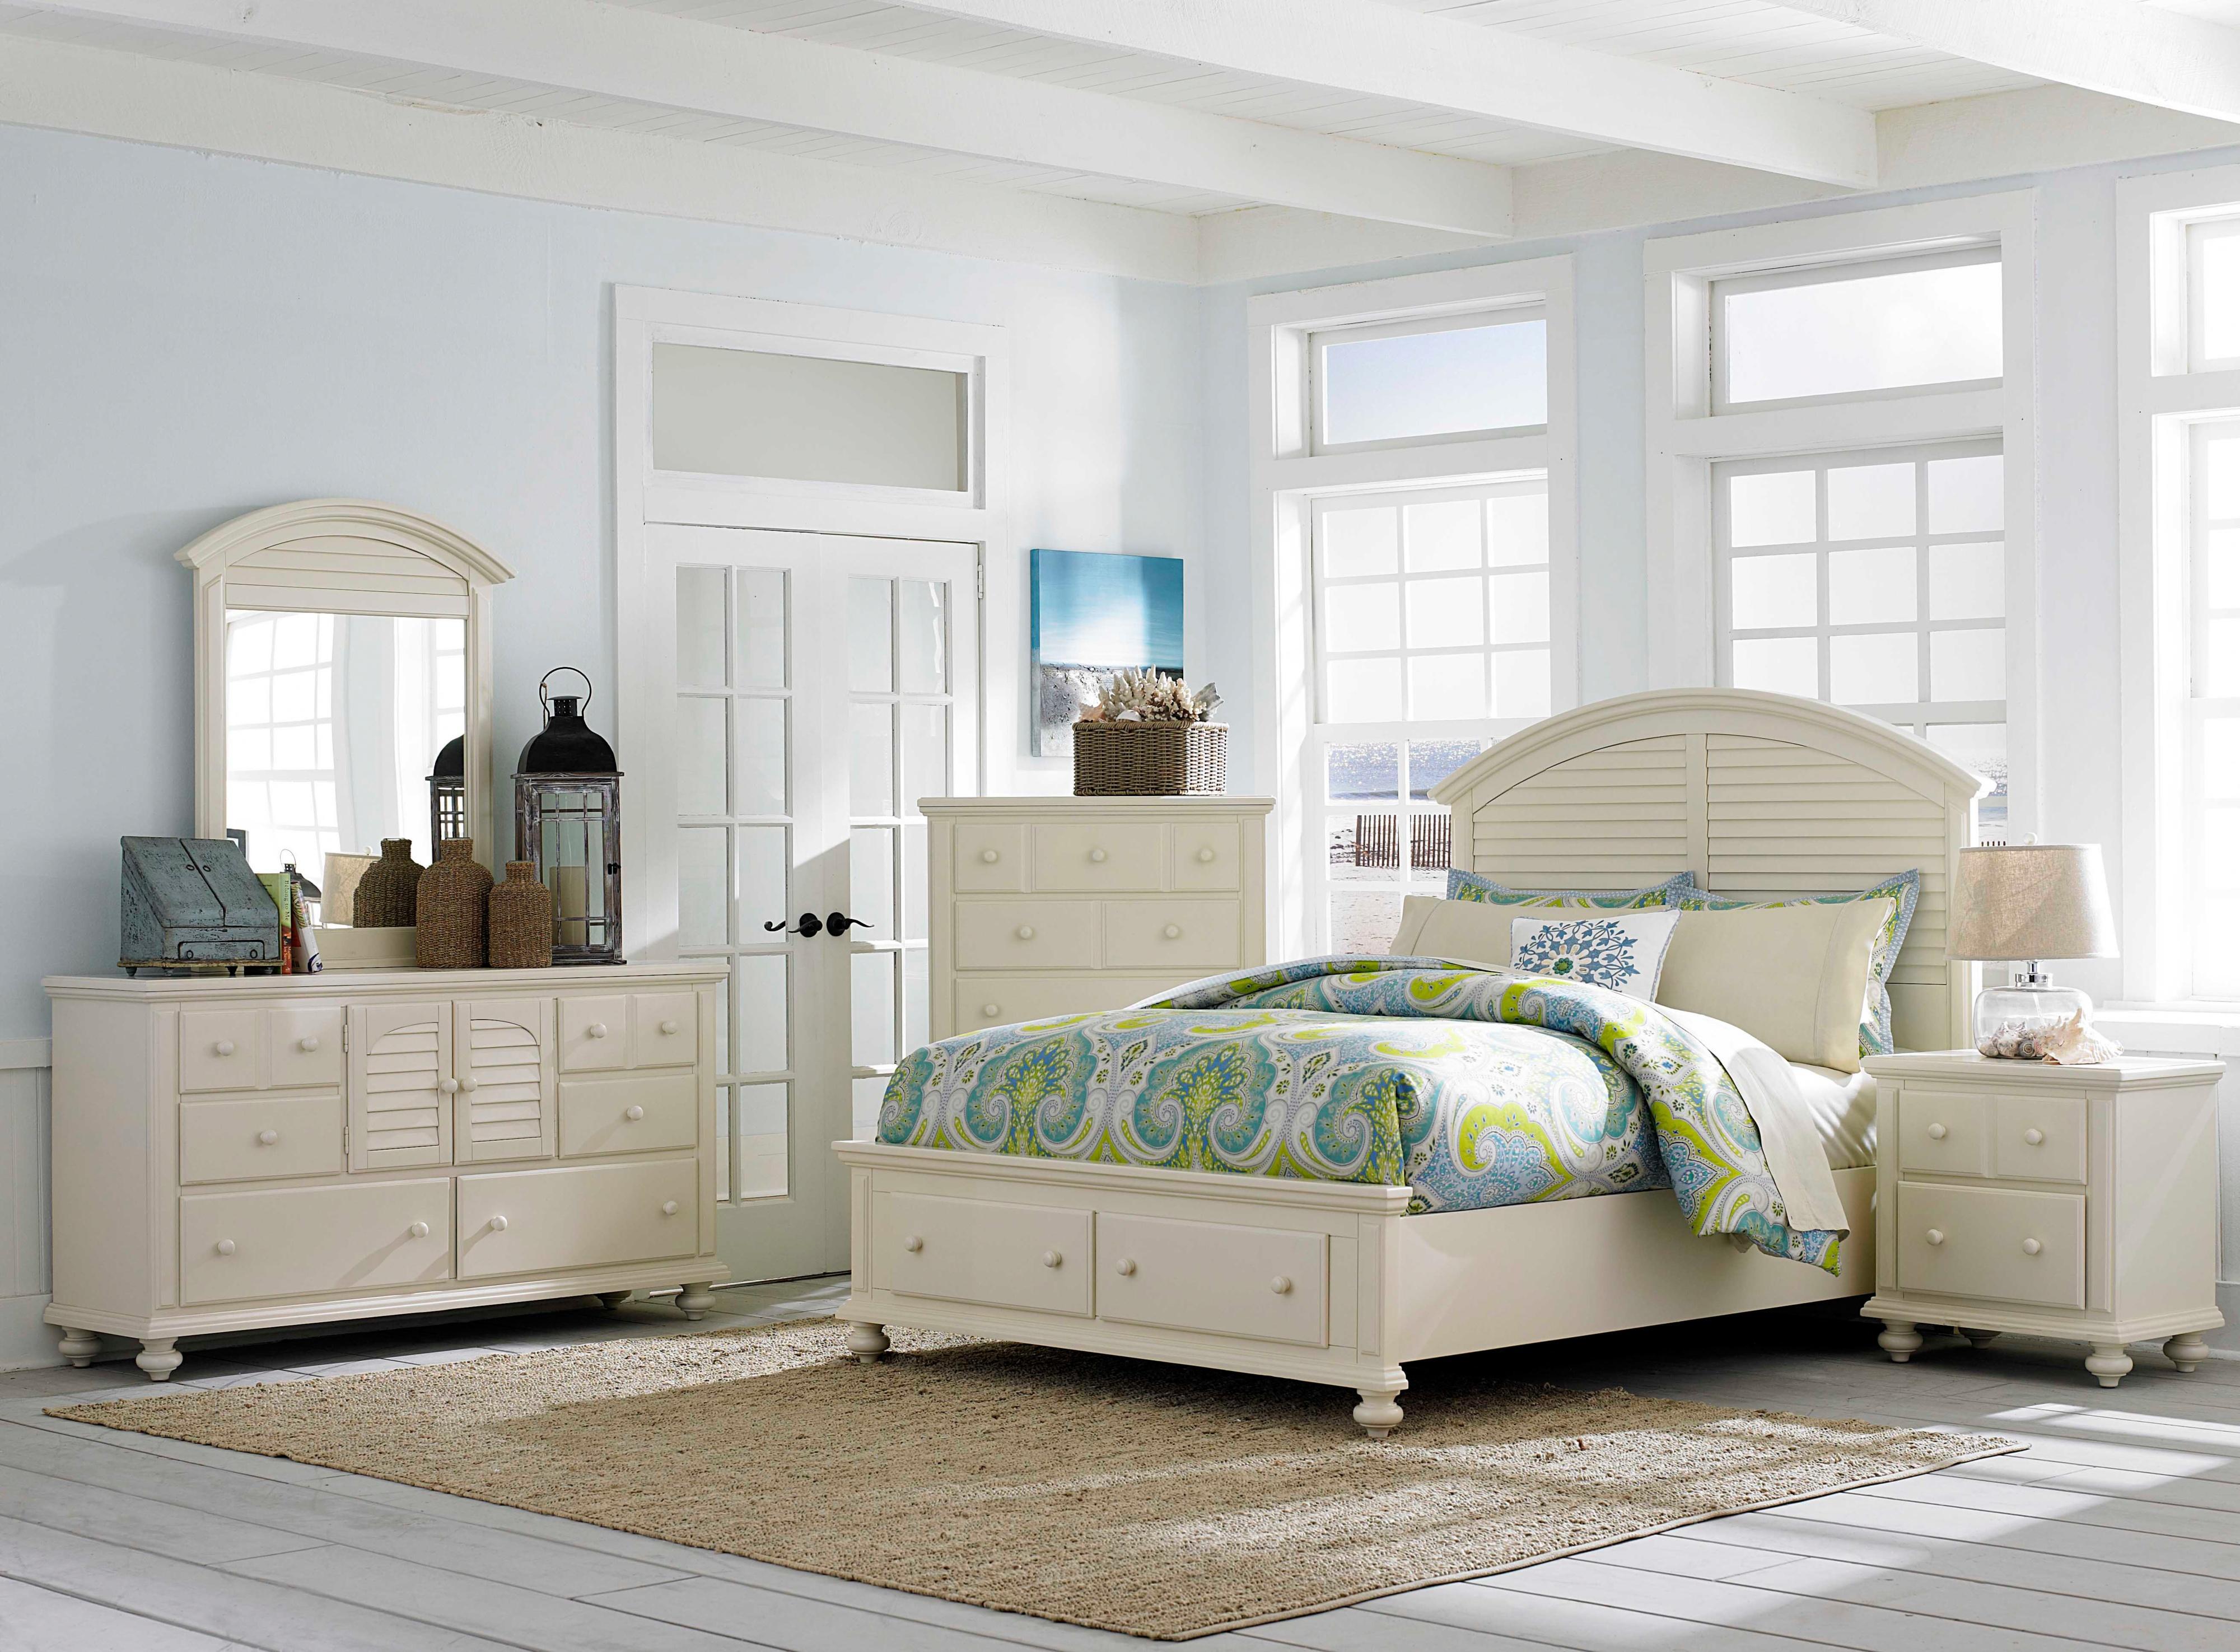 Broyhill Furniture Seabrooke 4471 232 2 Door Dresser With